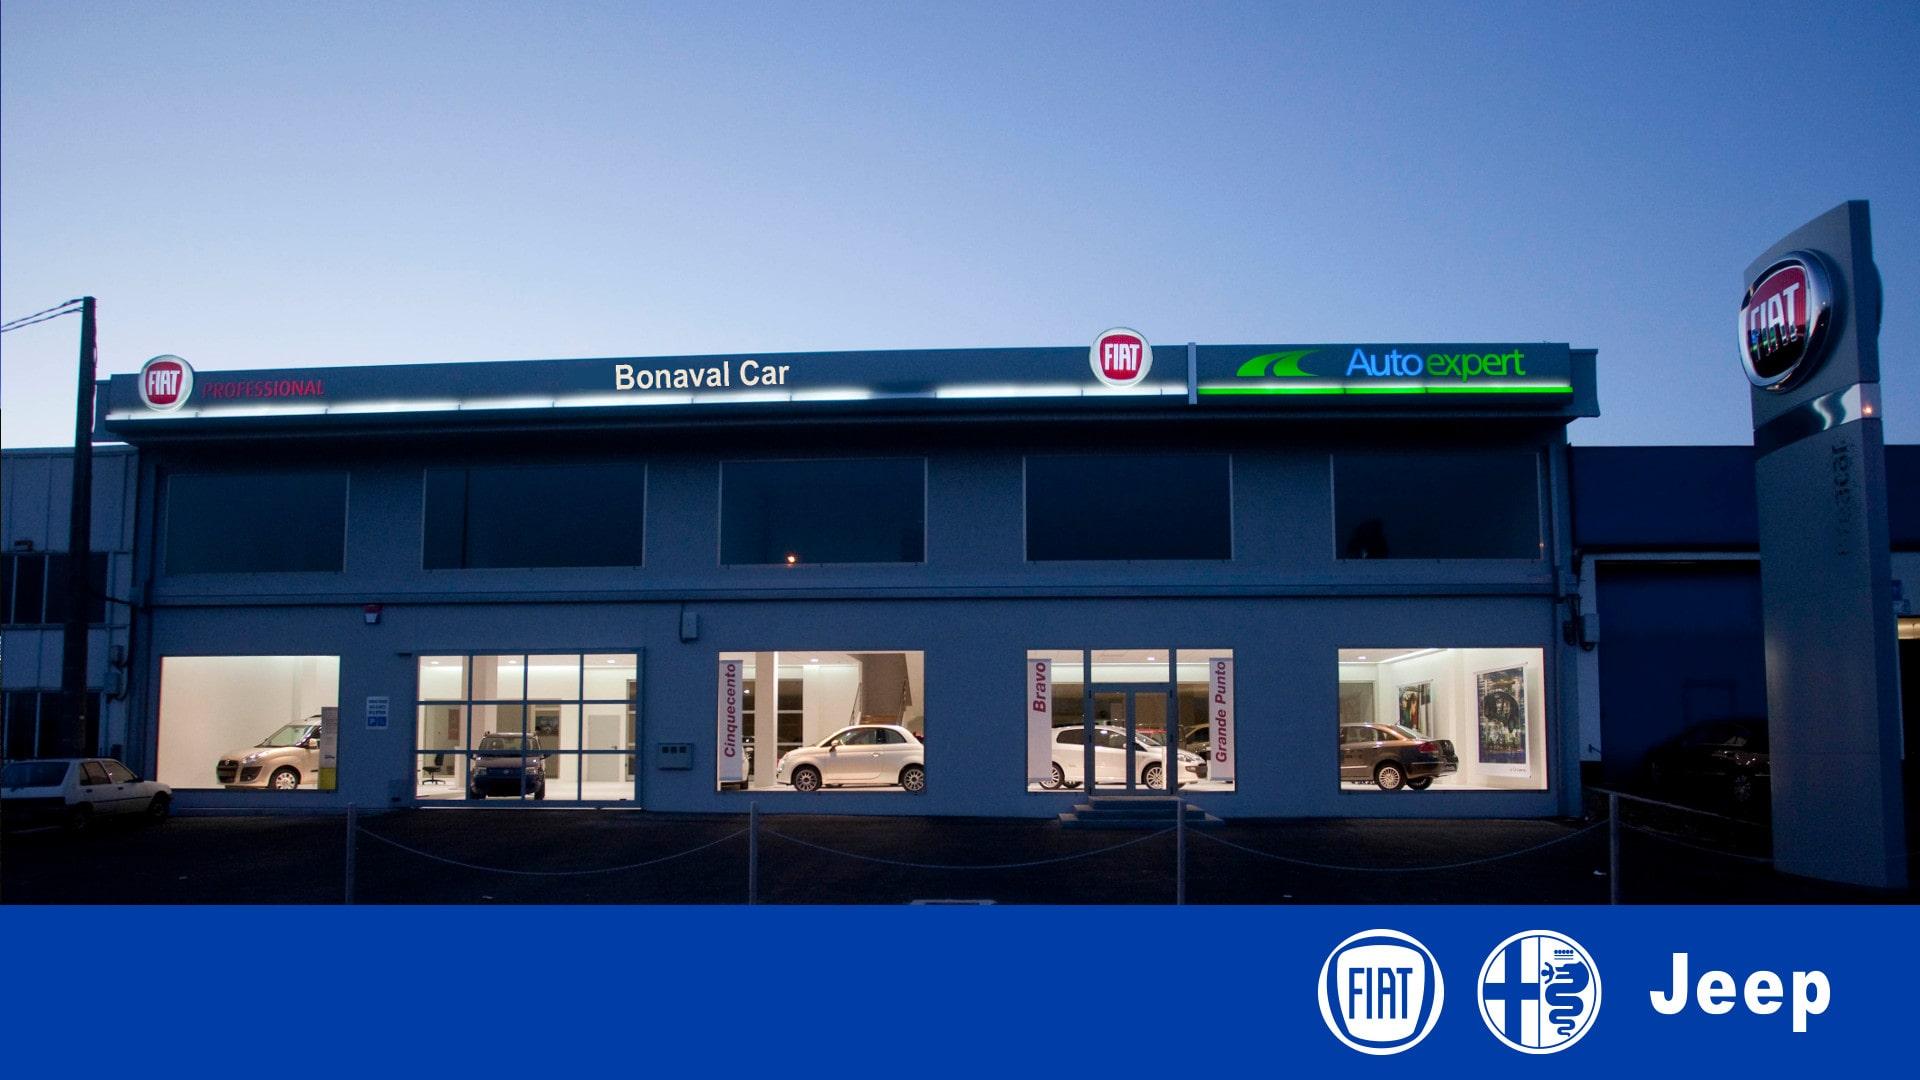 Bonaval Car: Fiat, Alfa Romeo, Jeep